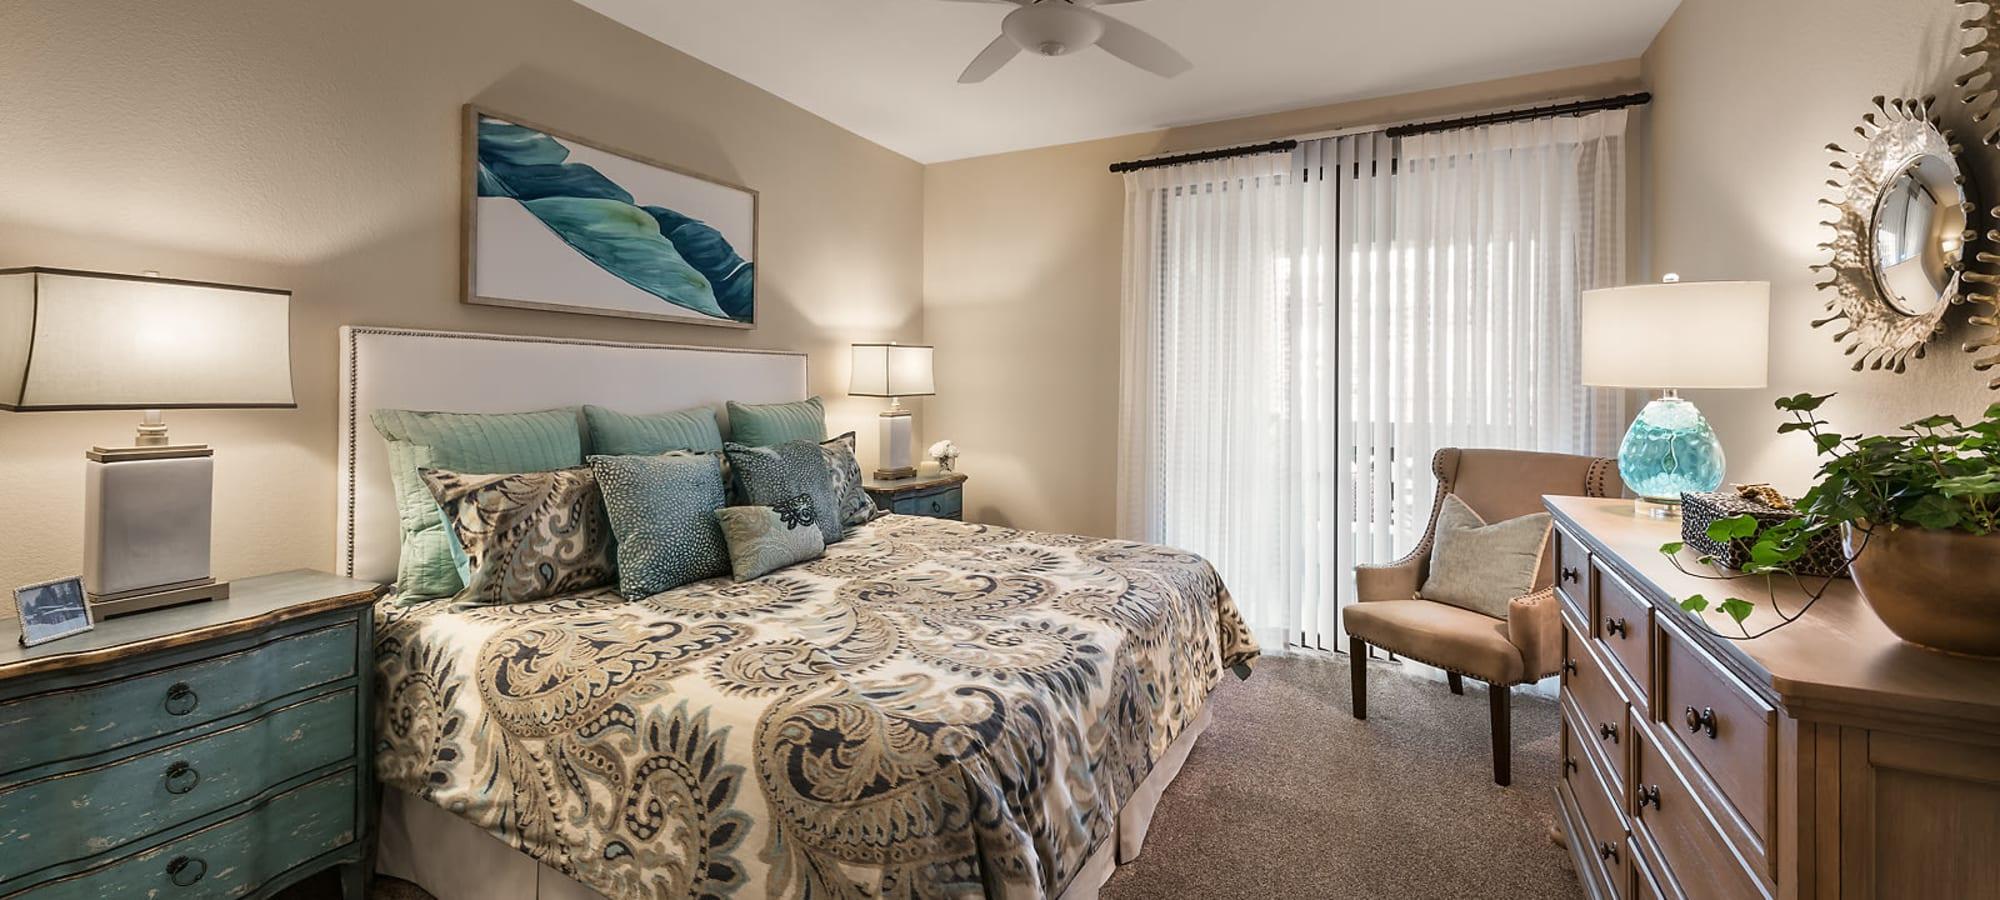 Spacious, primary bedroom at San Artes in Scottsdale, Arizona